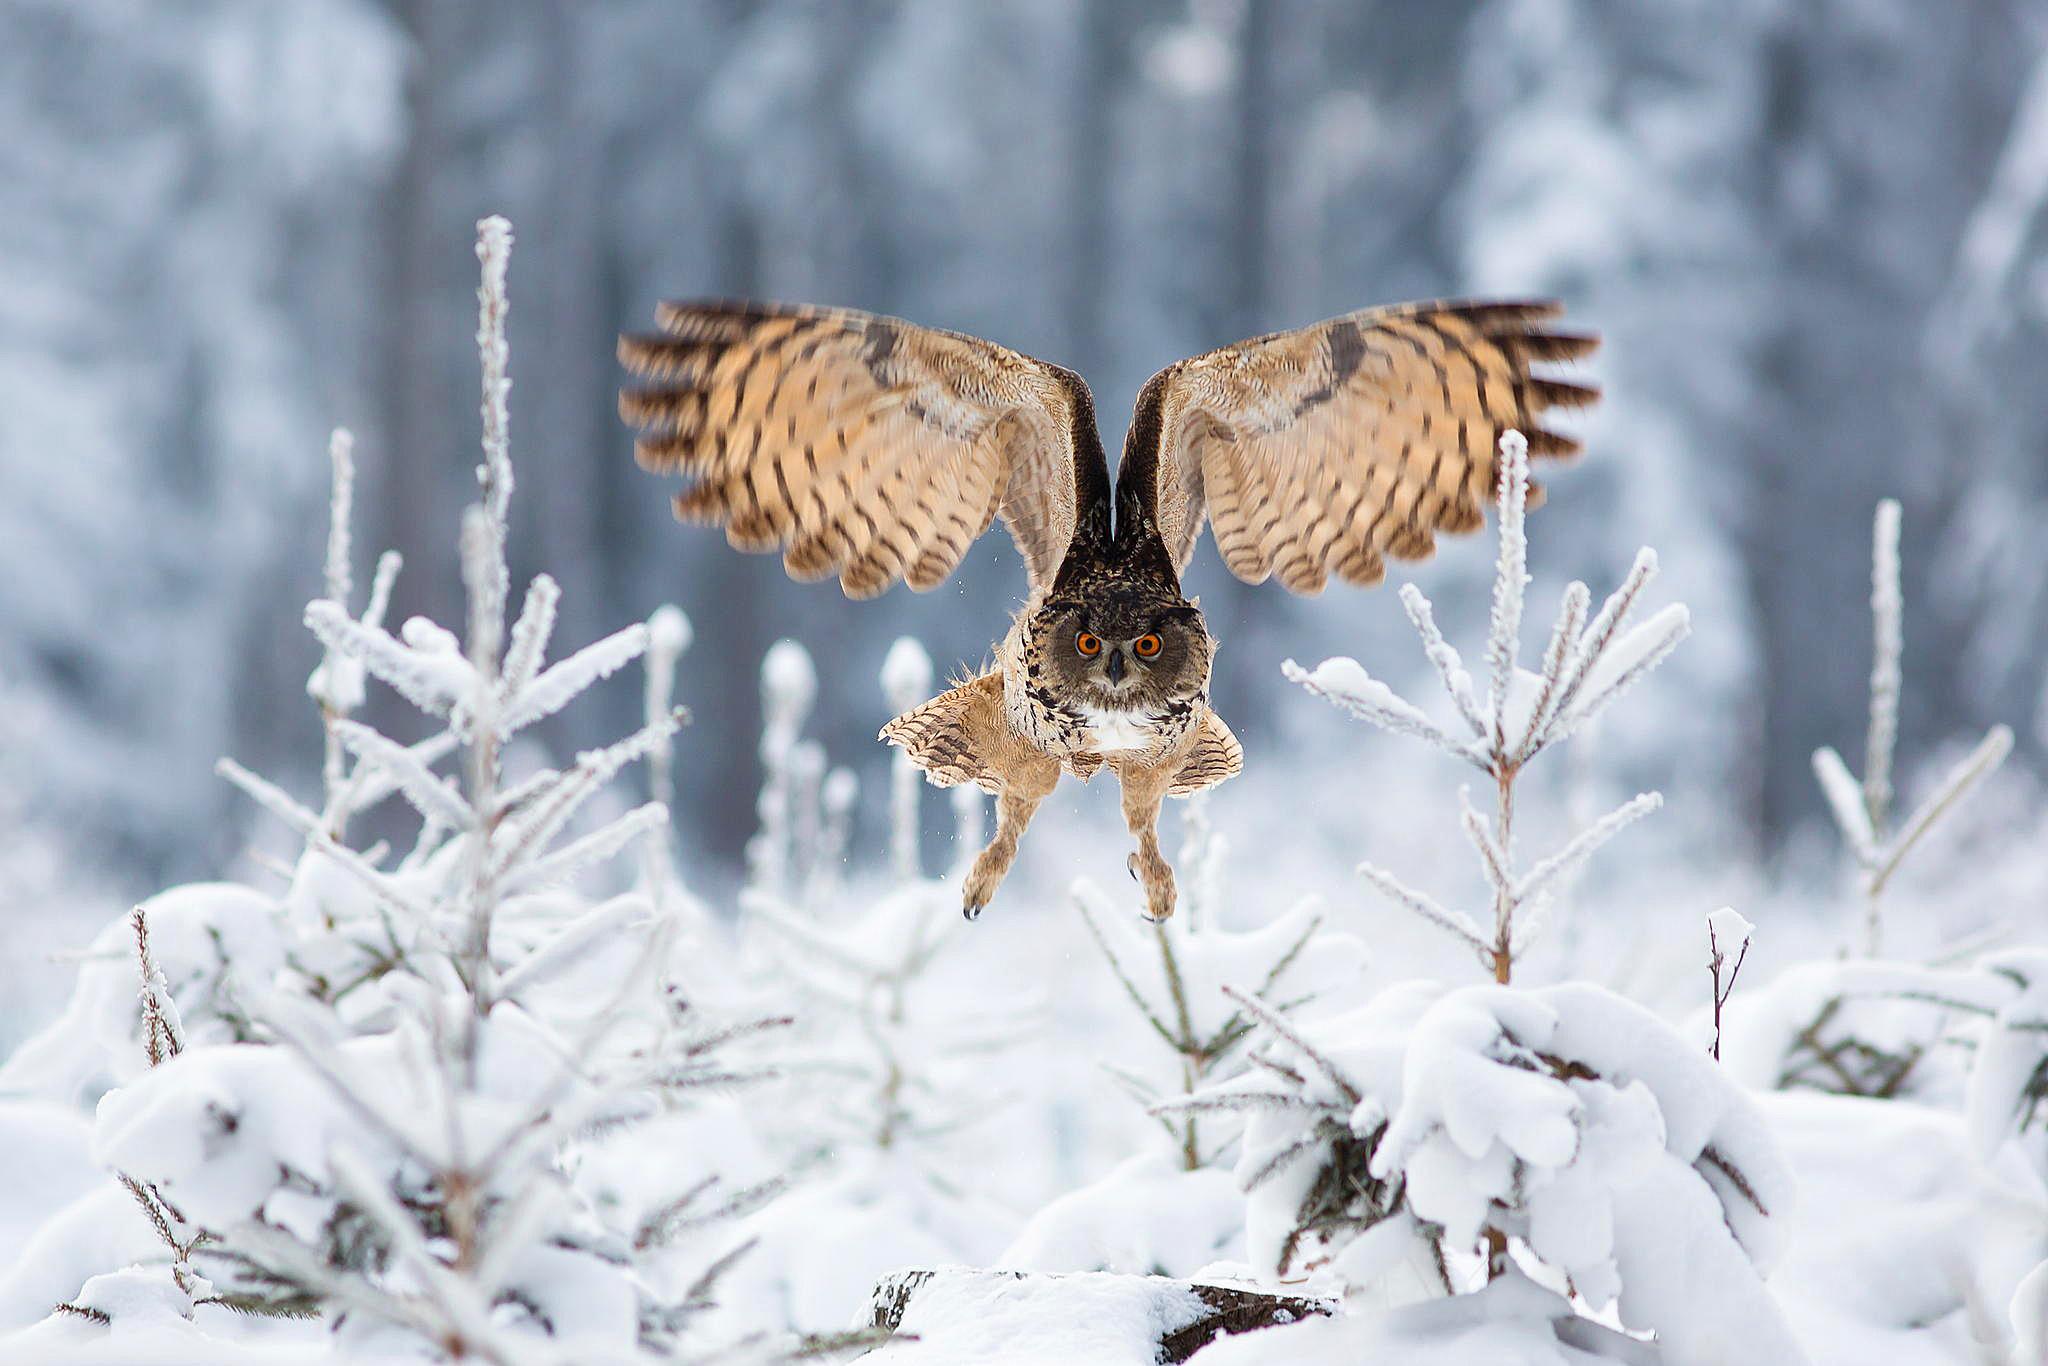 owl winter bird animal - photo #24